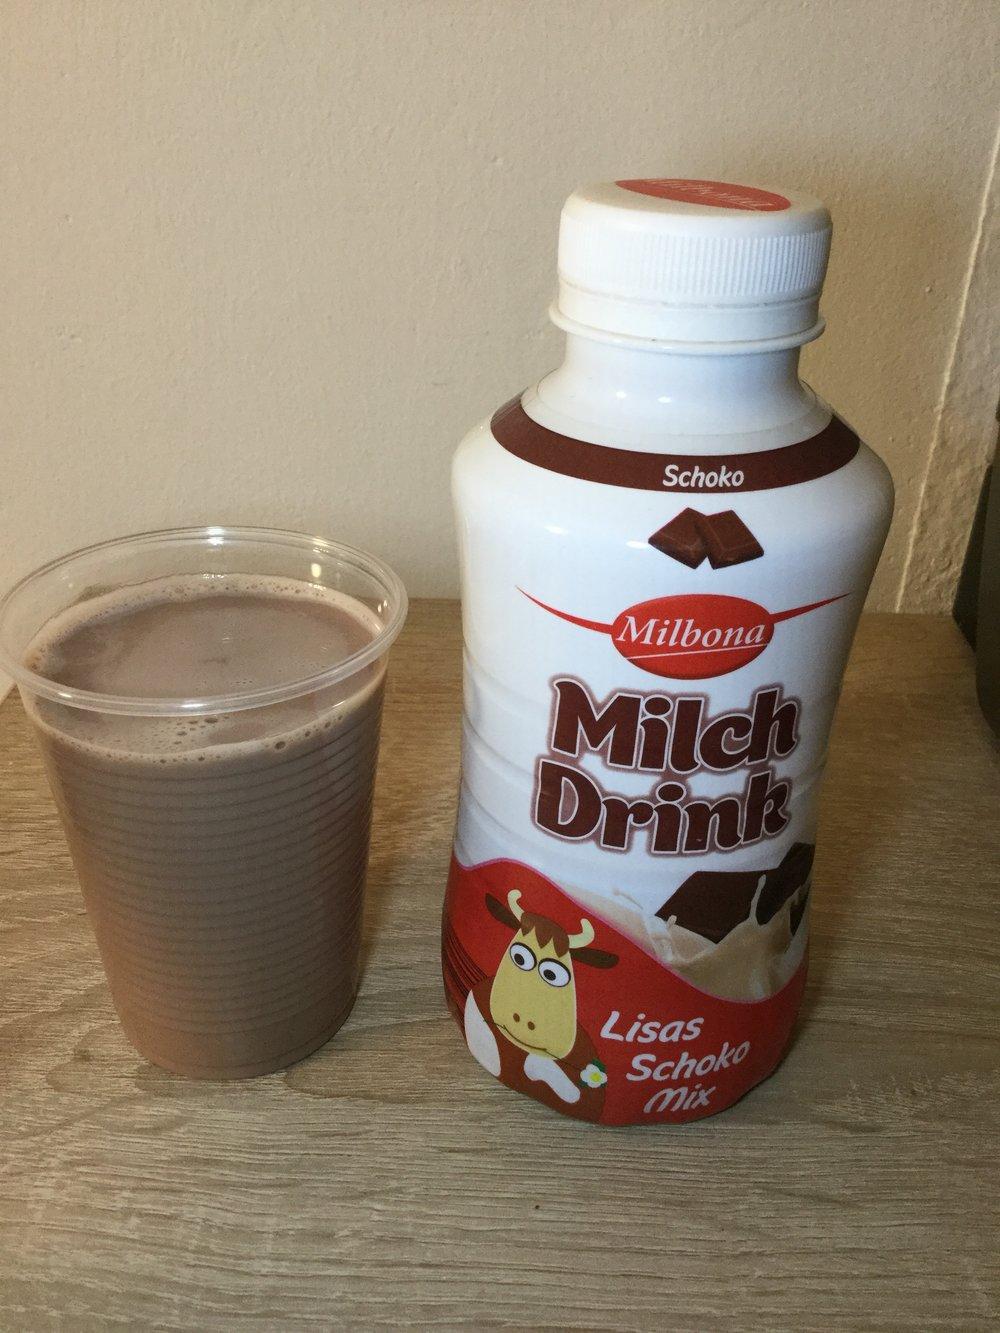 Milbona Milch Drink Lisas Schoko Mix Cup